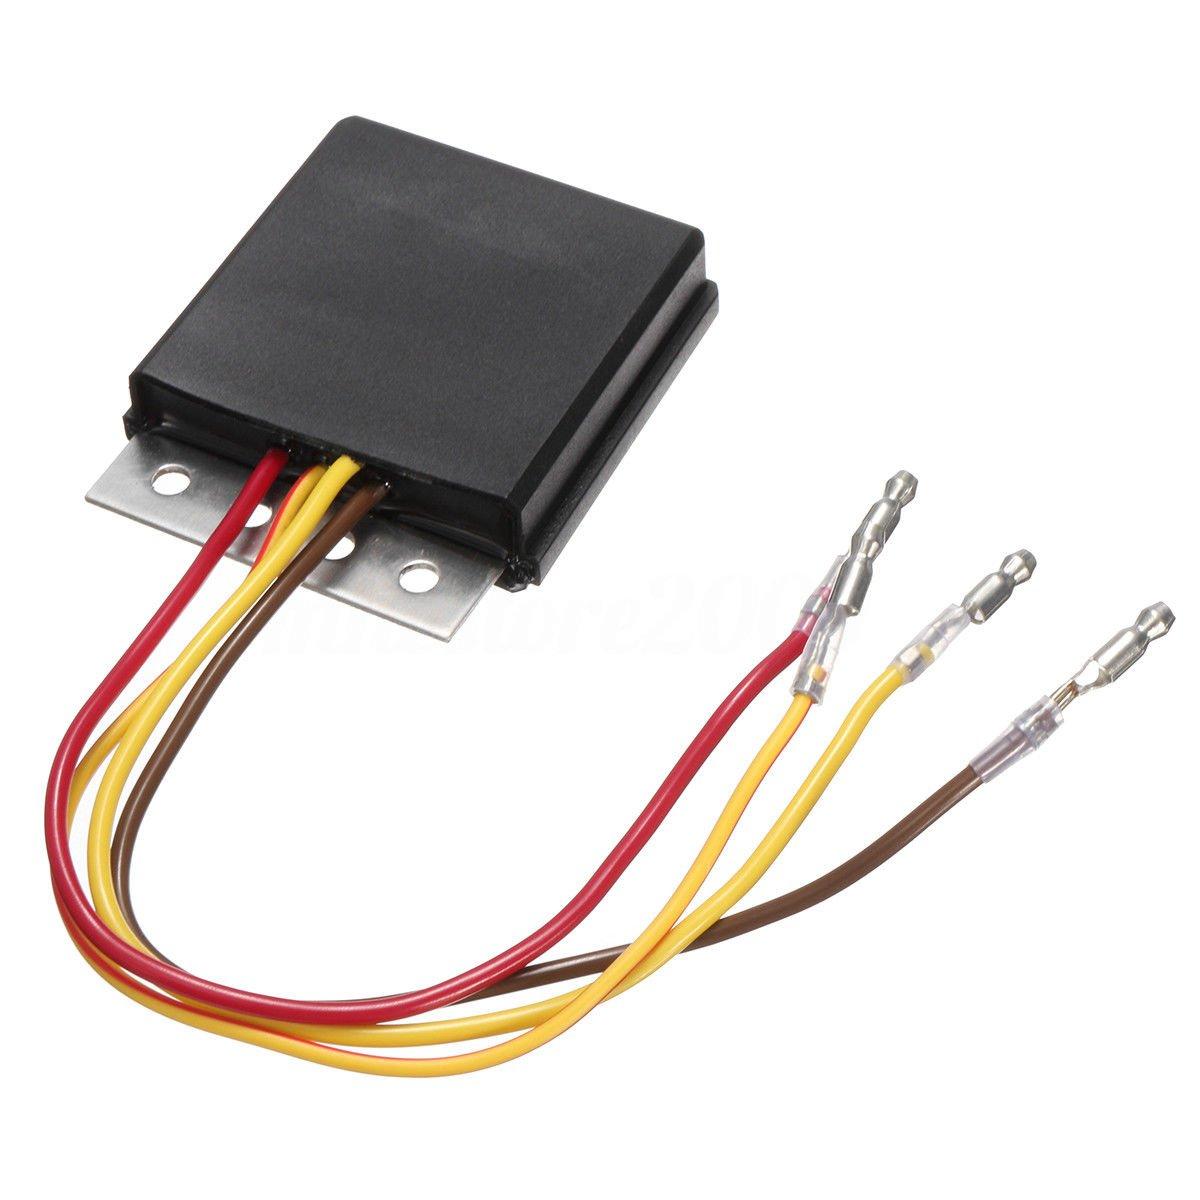 amazon com: li bai voltage rectifier regulator for atv polaris ranger 500  98-03 4060173 2203636 1998-2002 polaris sportsman 500 ho pse rse duse  freedom atv: